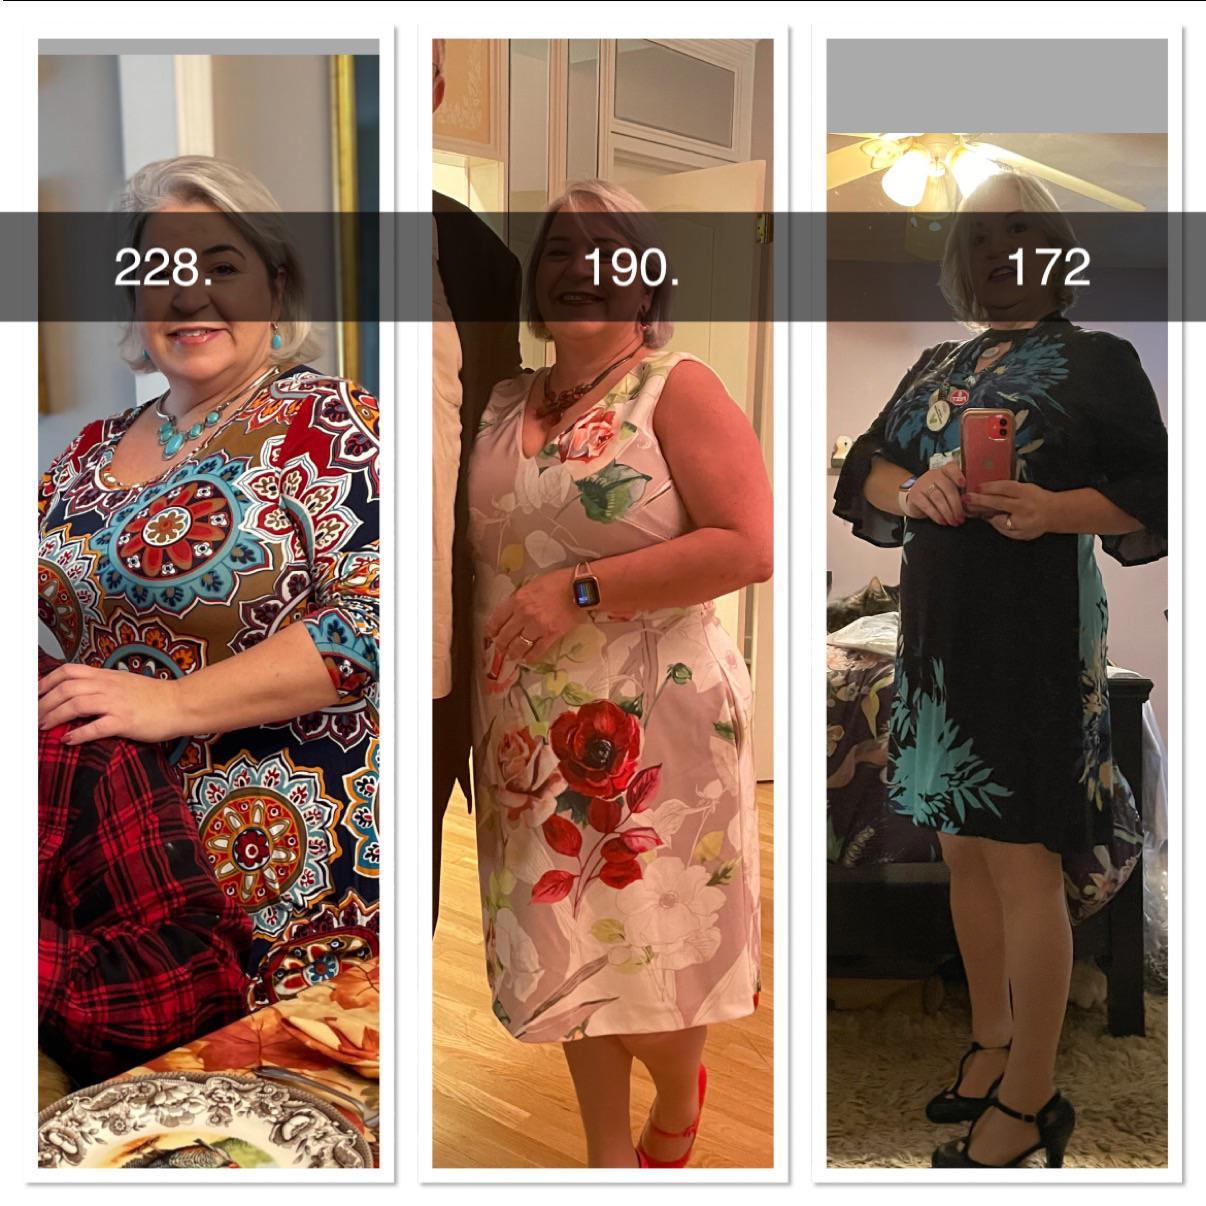 5'2 Female Progress Pics of 56 lbs Weight Loss 228 lbs to 172 lbs